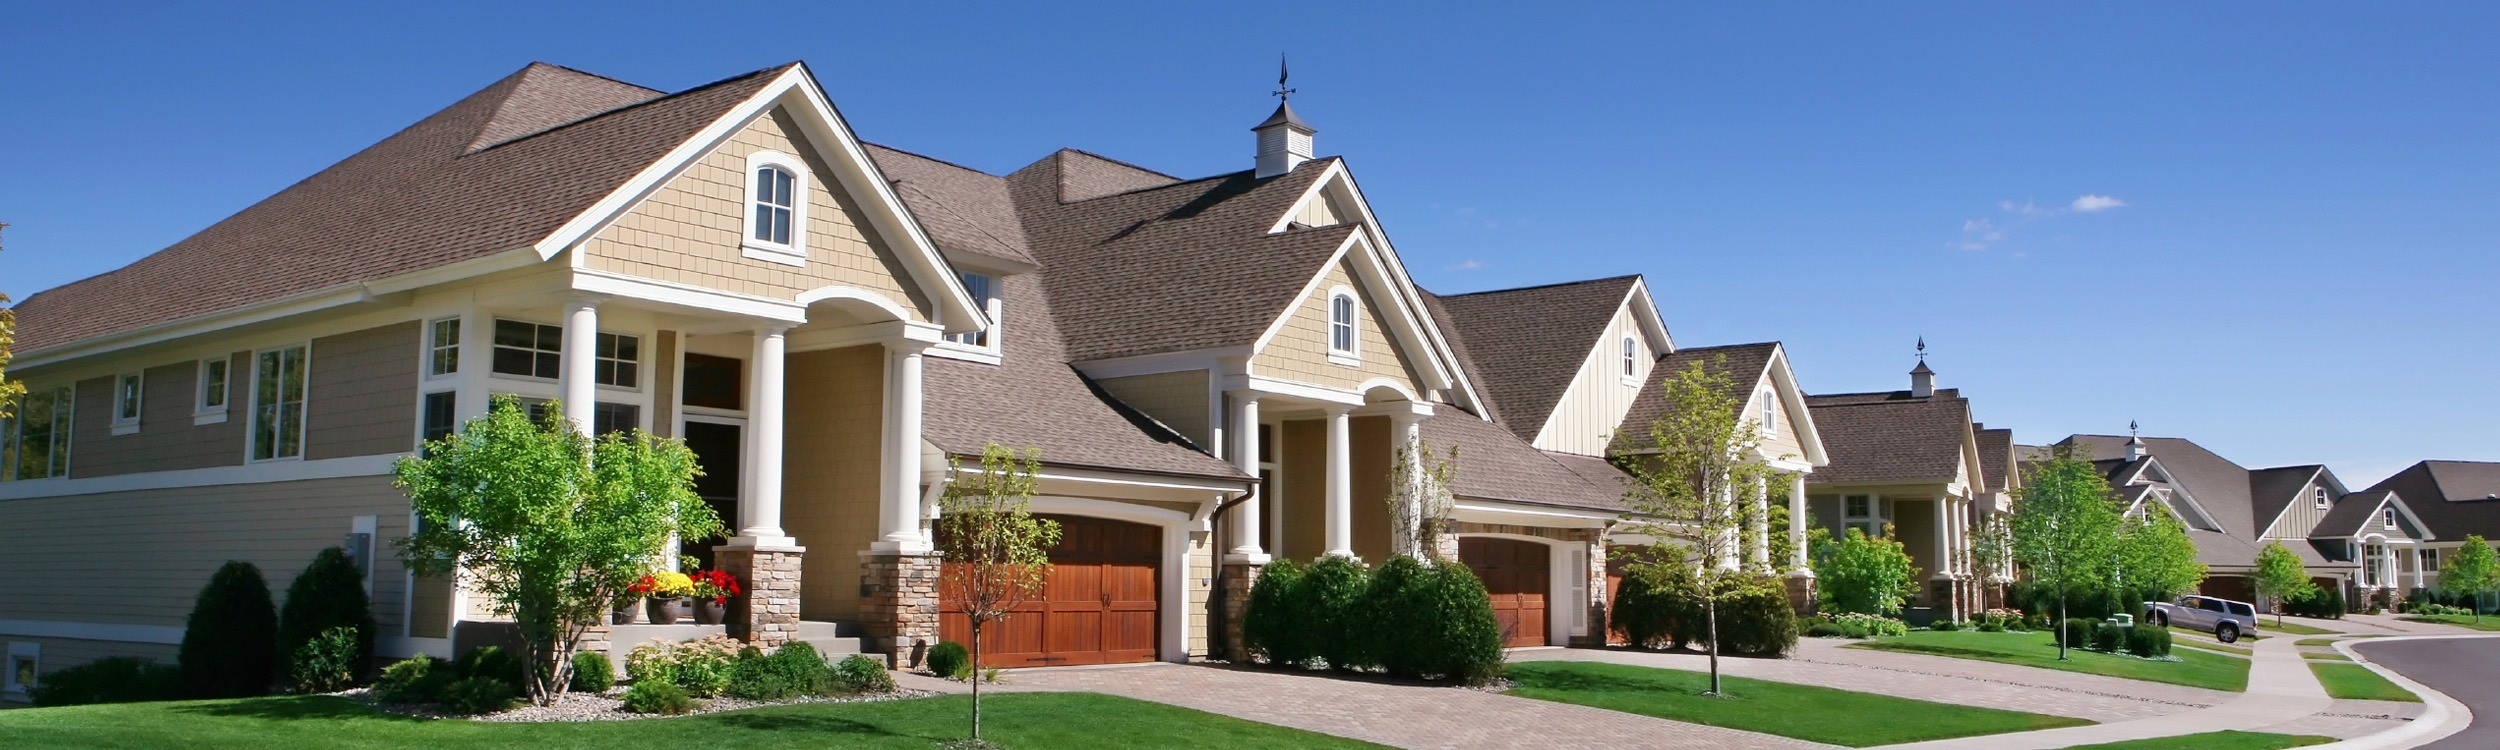 Apollo Homeowners Insurance